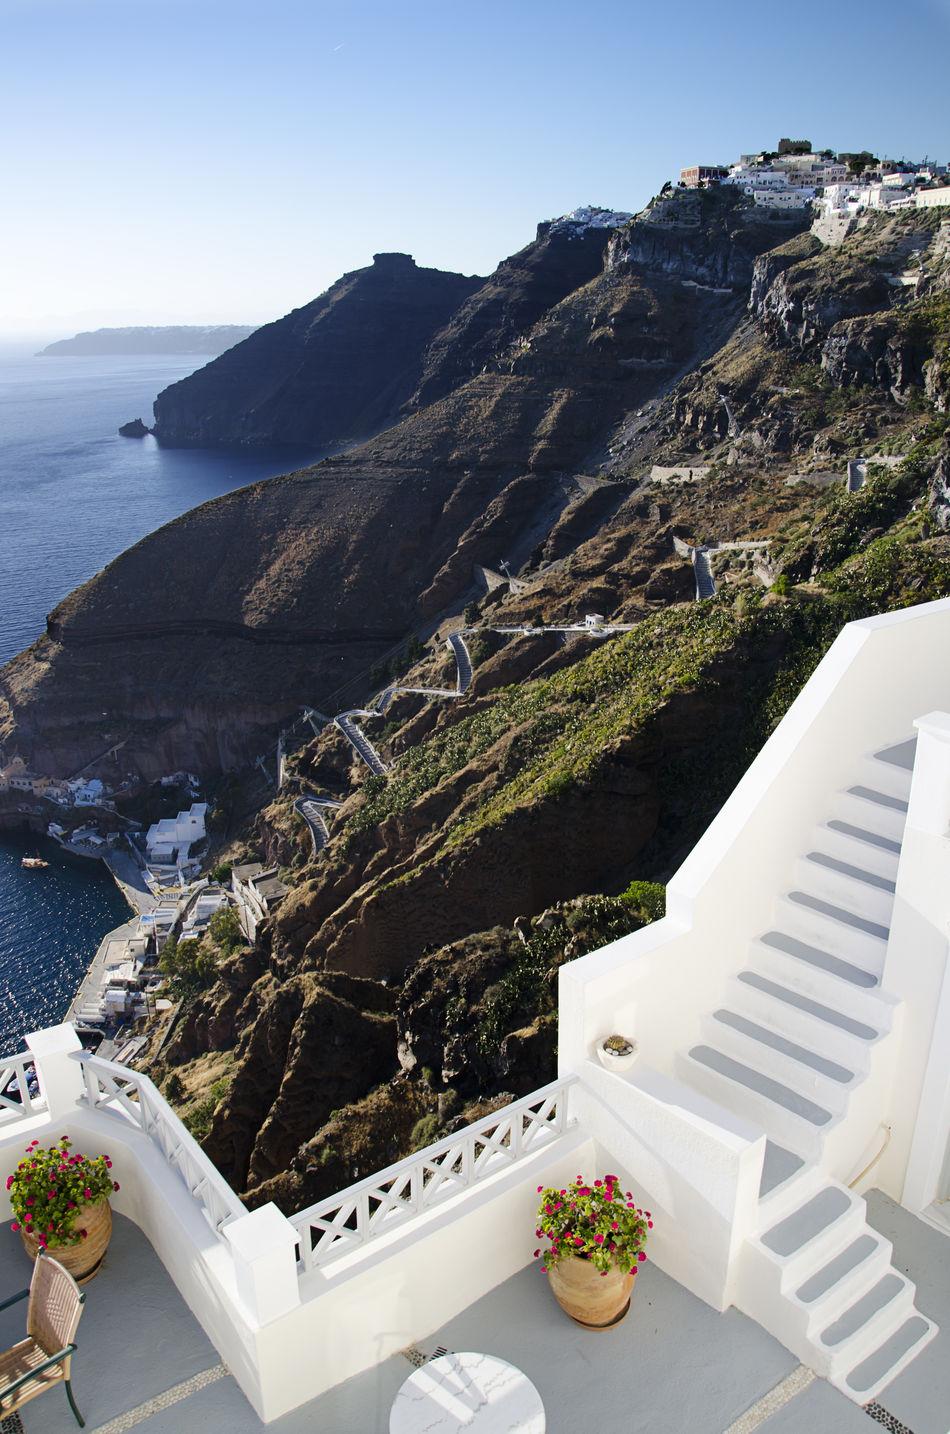 Aegean Sea Beautiful Views Cliffs Cliffside Greece Islands Santorini Greece Santorini Island Sea Views